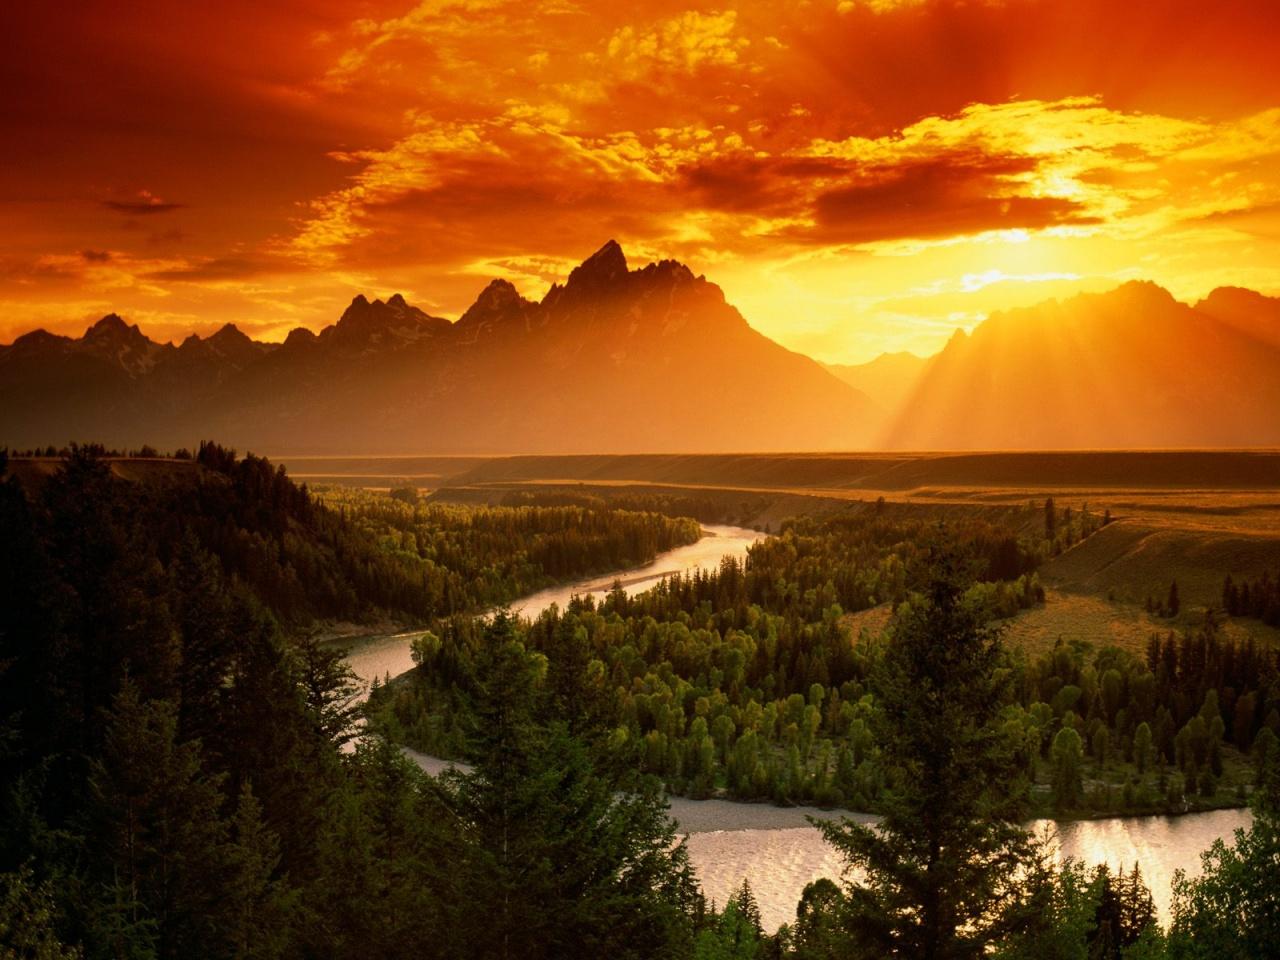 Free screensavers download saversplanet nature scenery wallpaper voltagebd Gallery